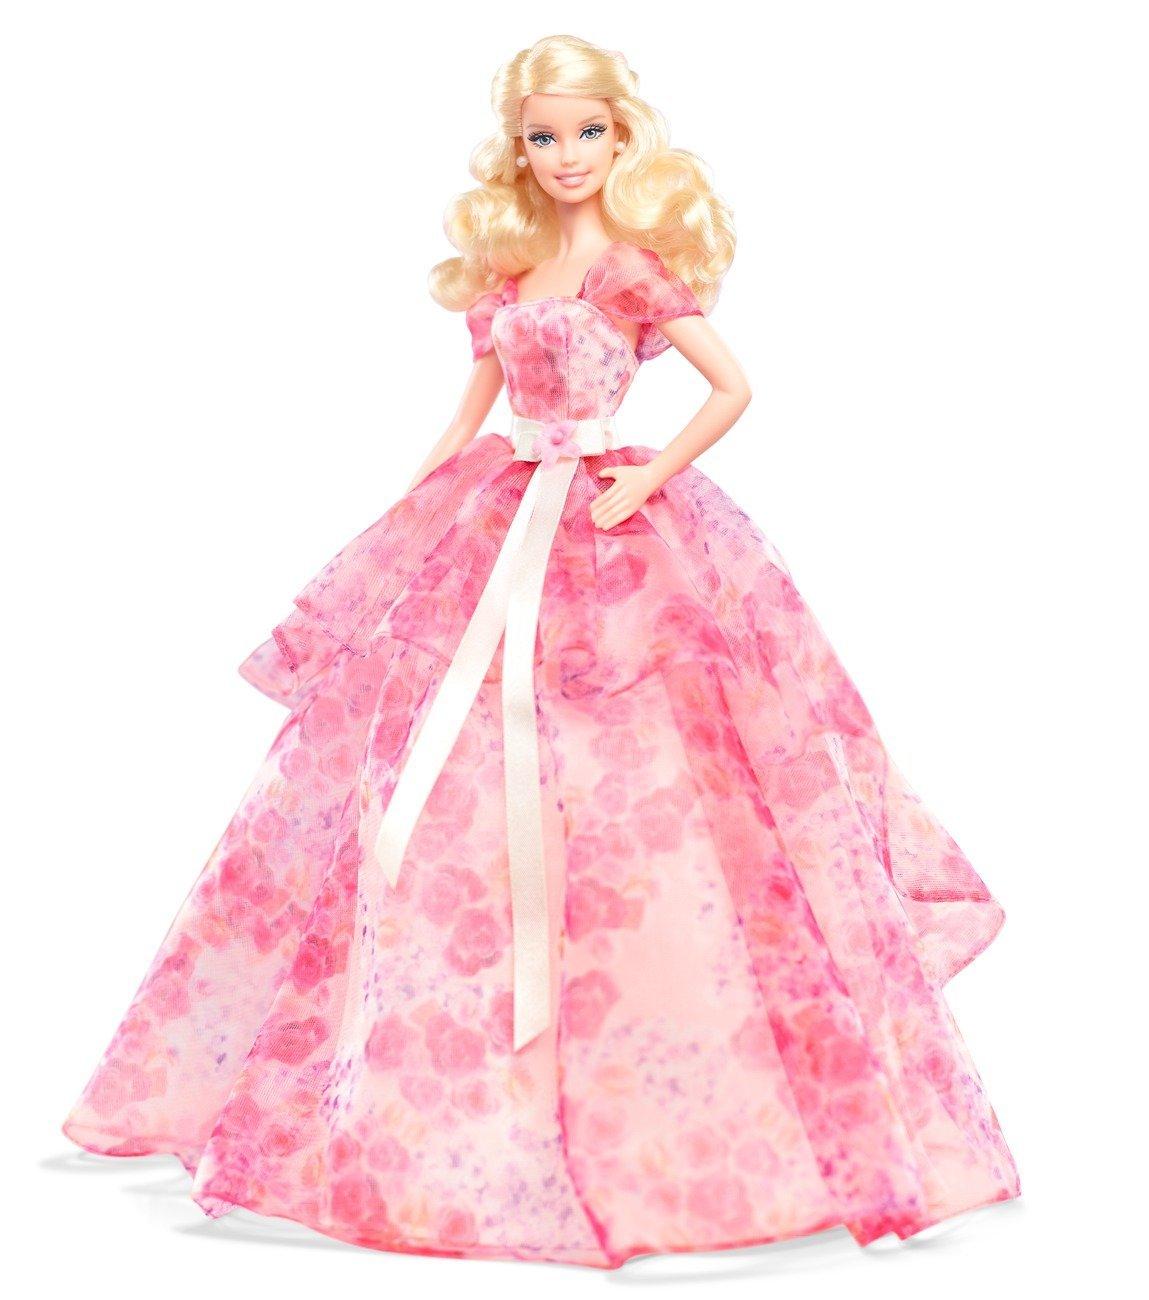 Coloriage barbie miroir imprimer - Robe barbie adulte ...